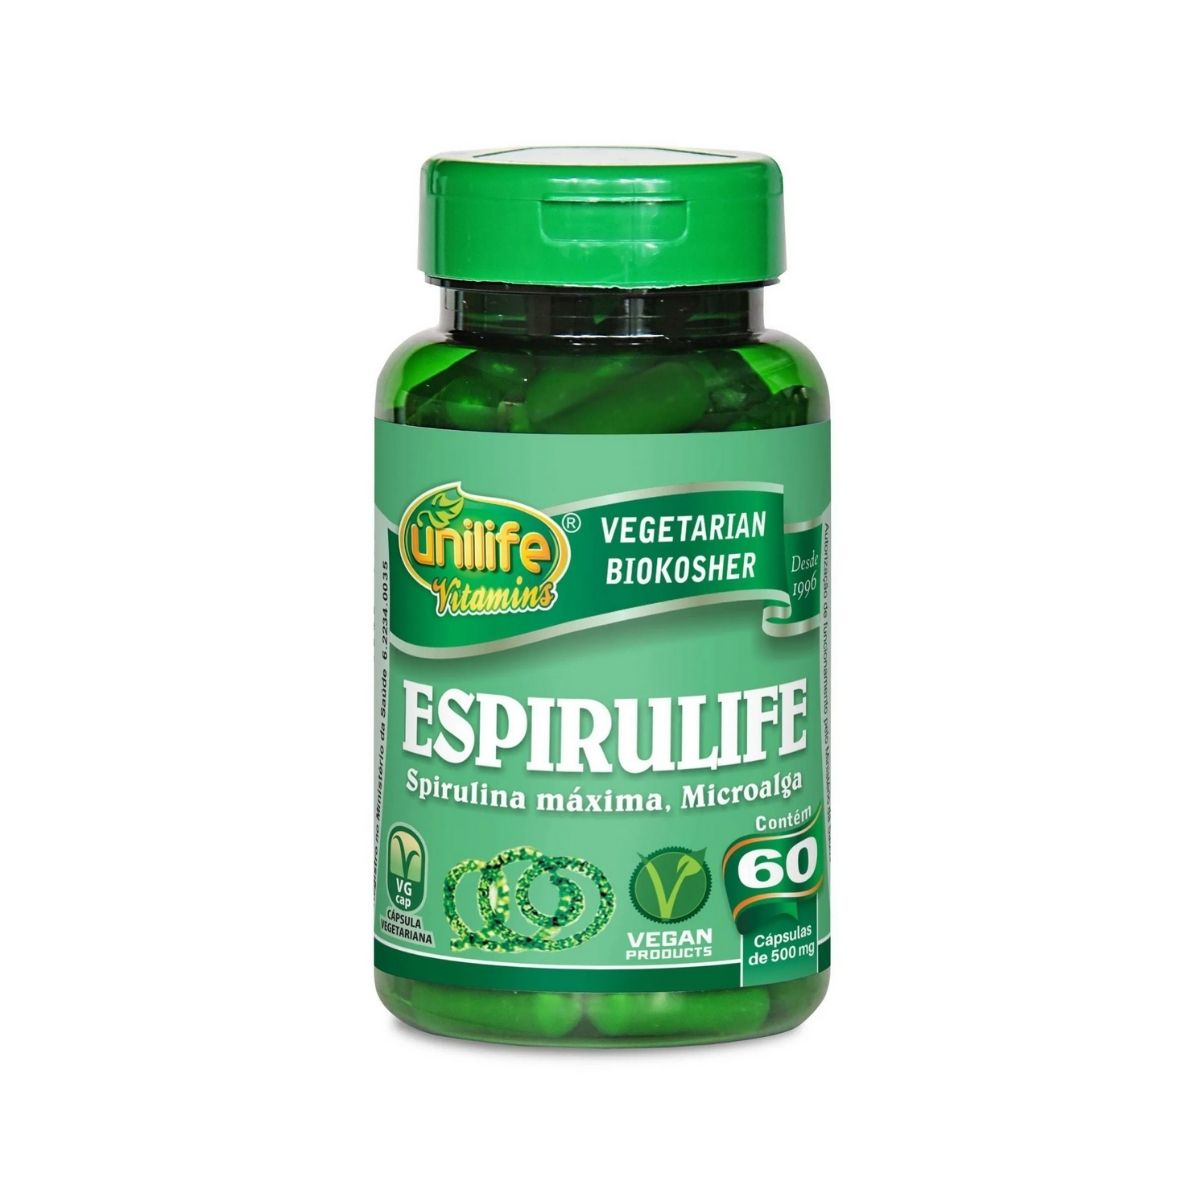 Espirulife